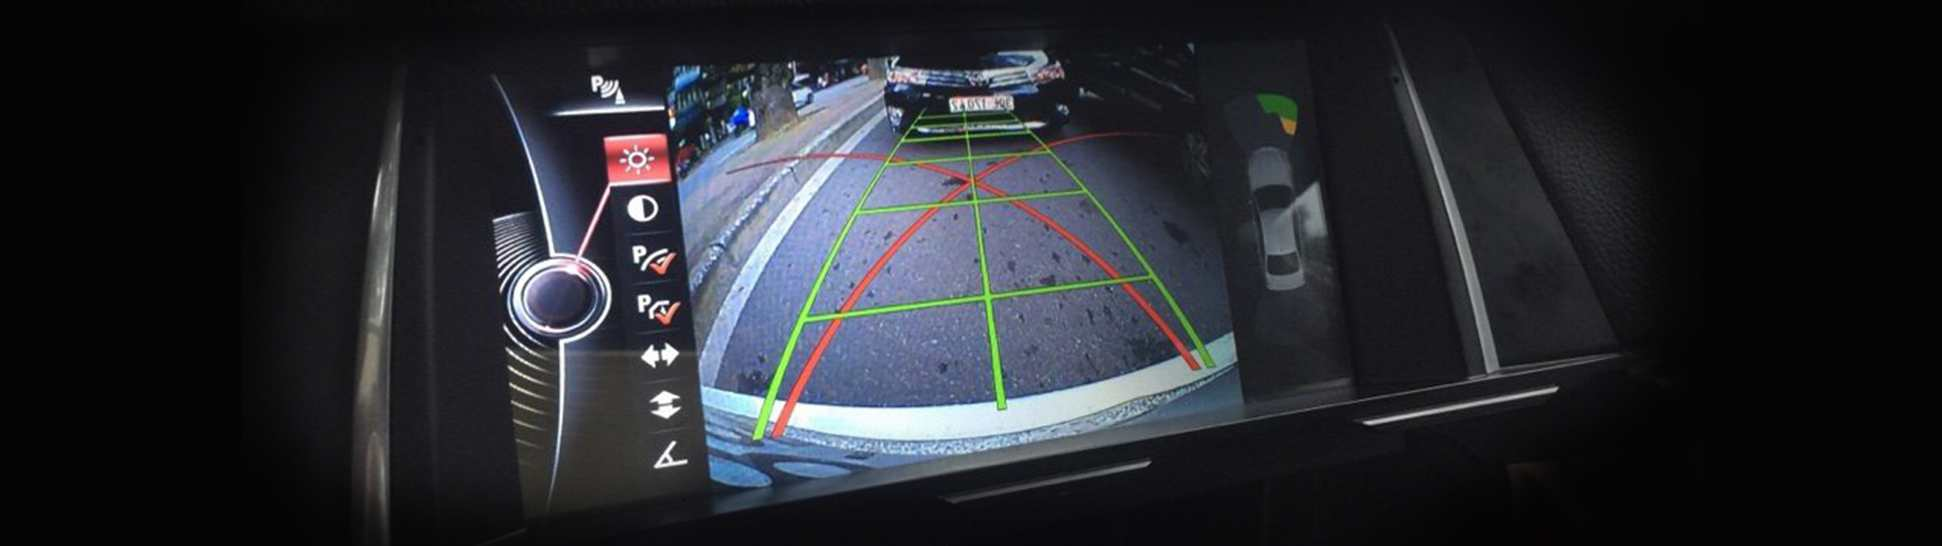 Banner camera 360 oris